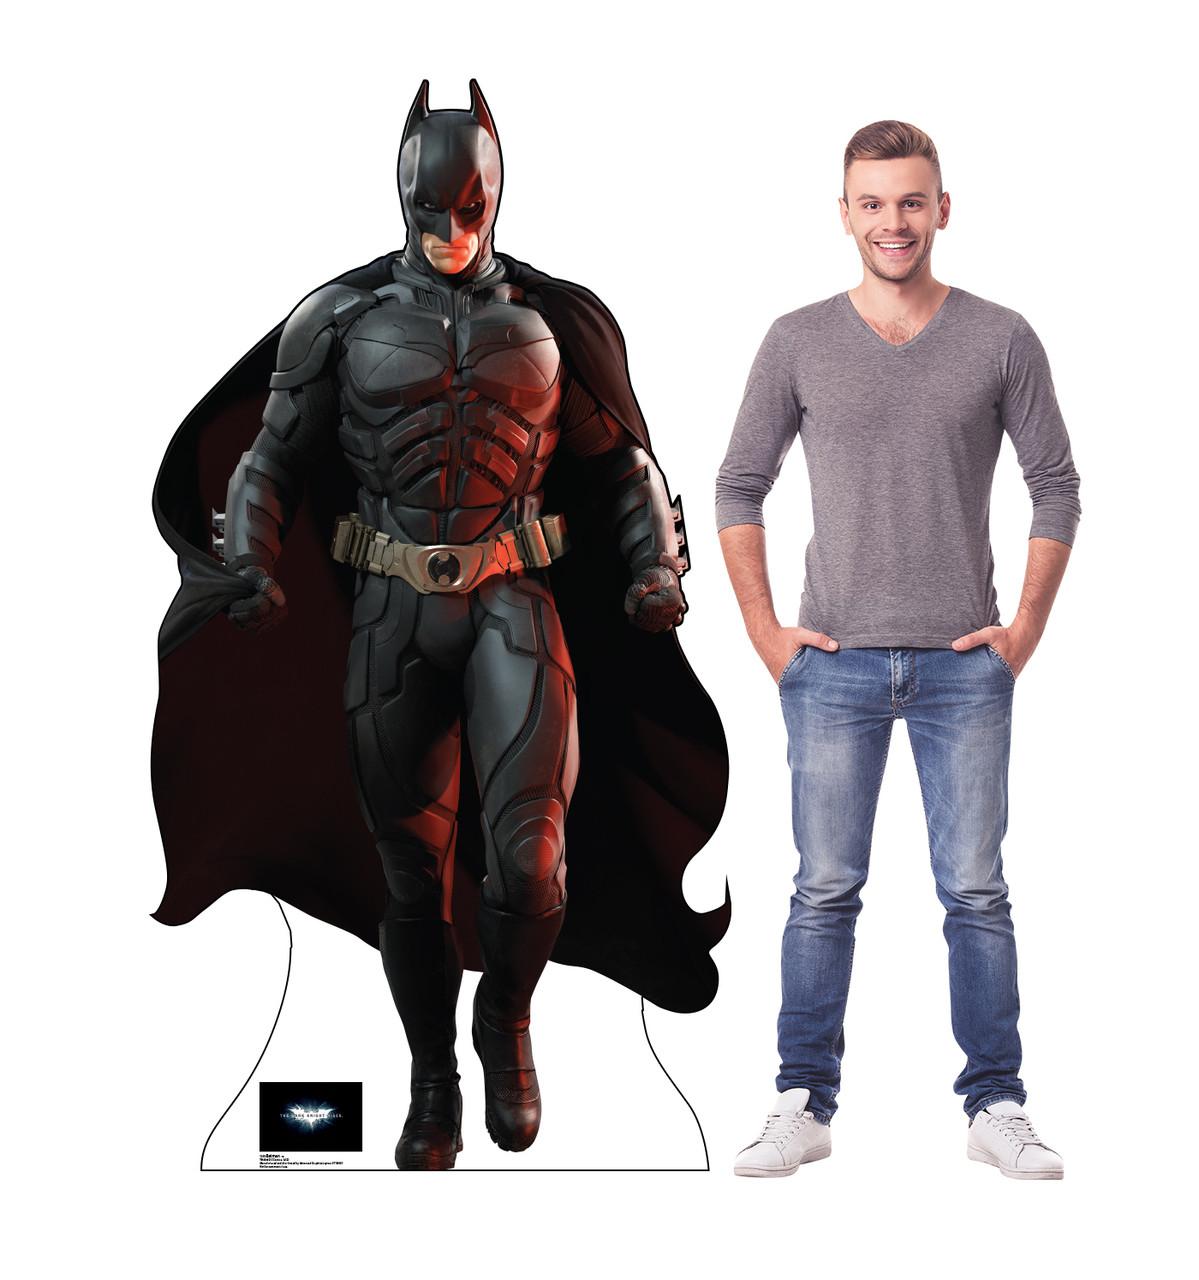 Batman - Dark Knight Rises Cardboard Cutout Lifesize